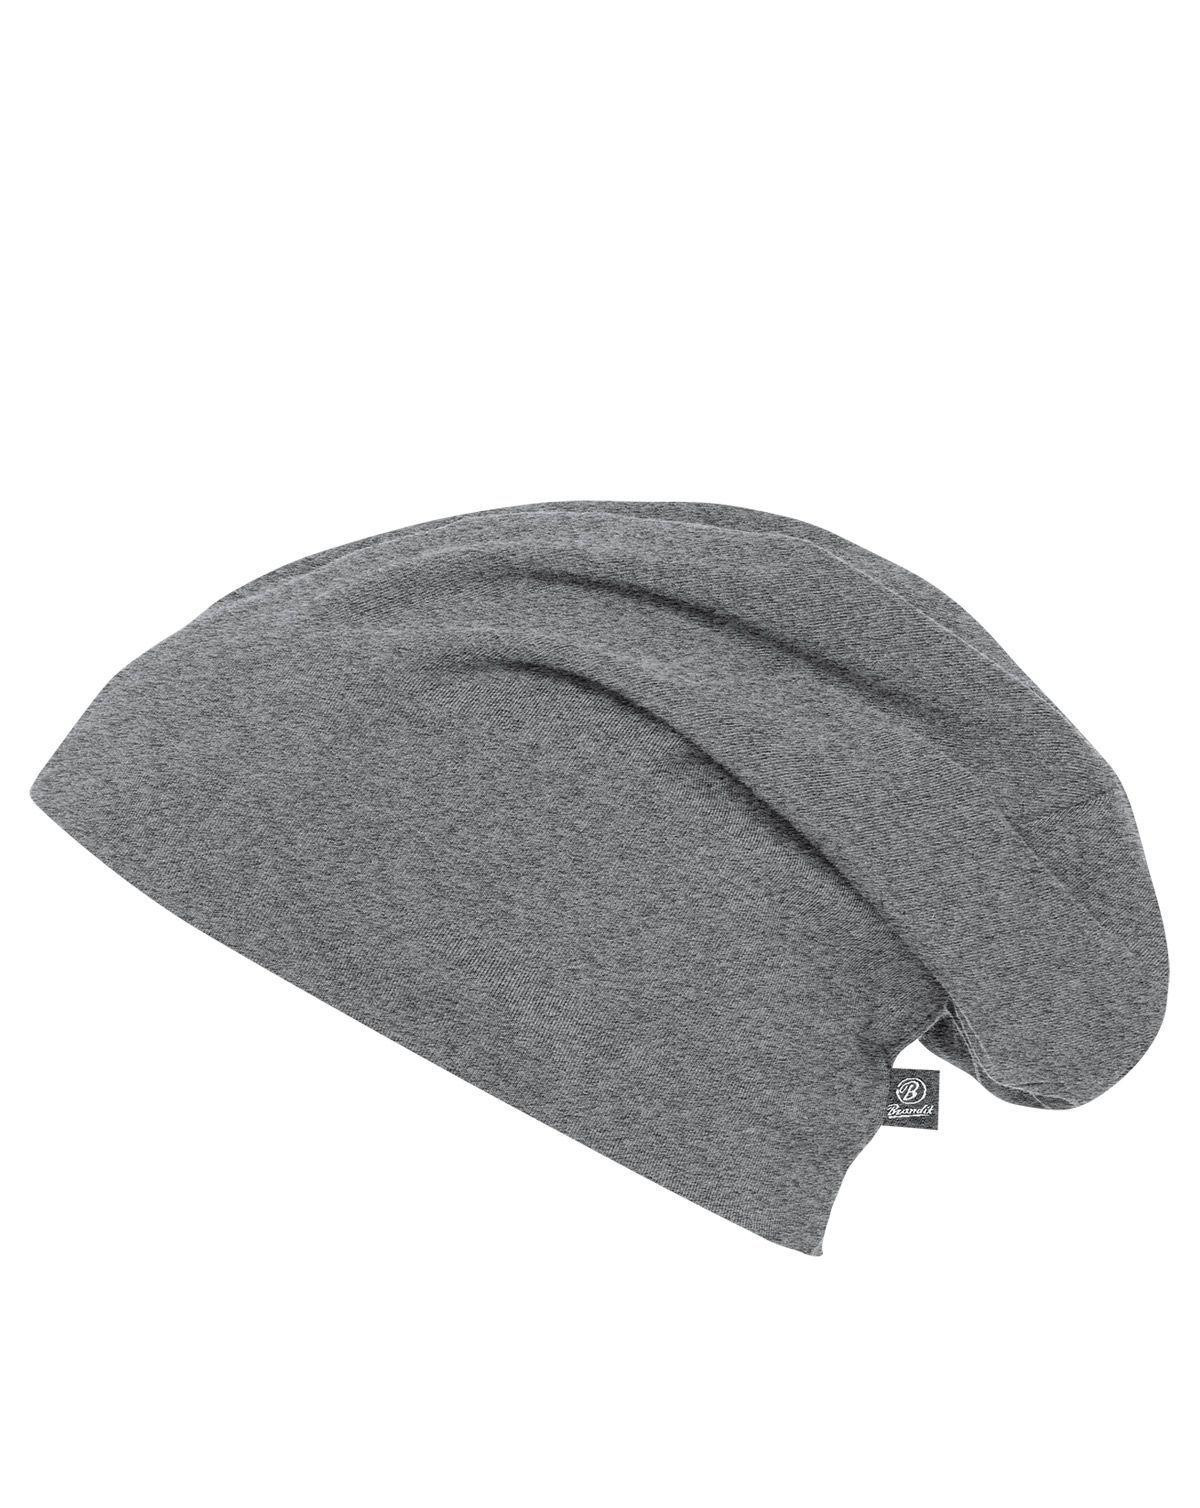 Image of   Brandit Jersey Hue (Antracit, M/L)